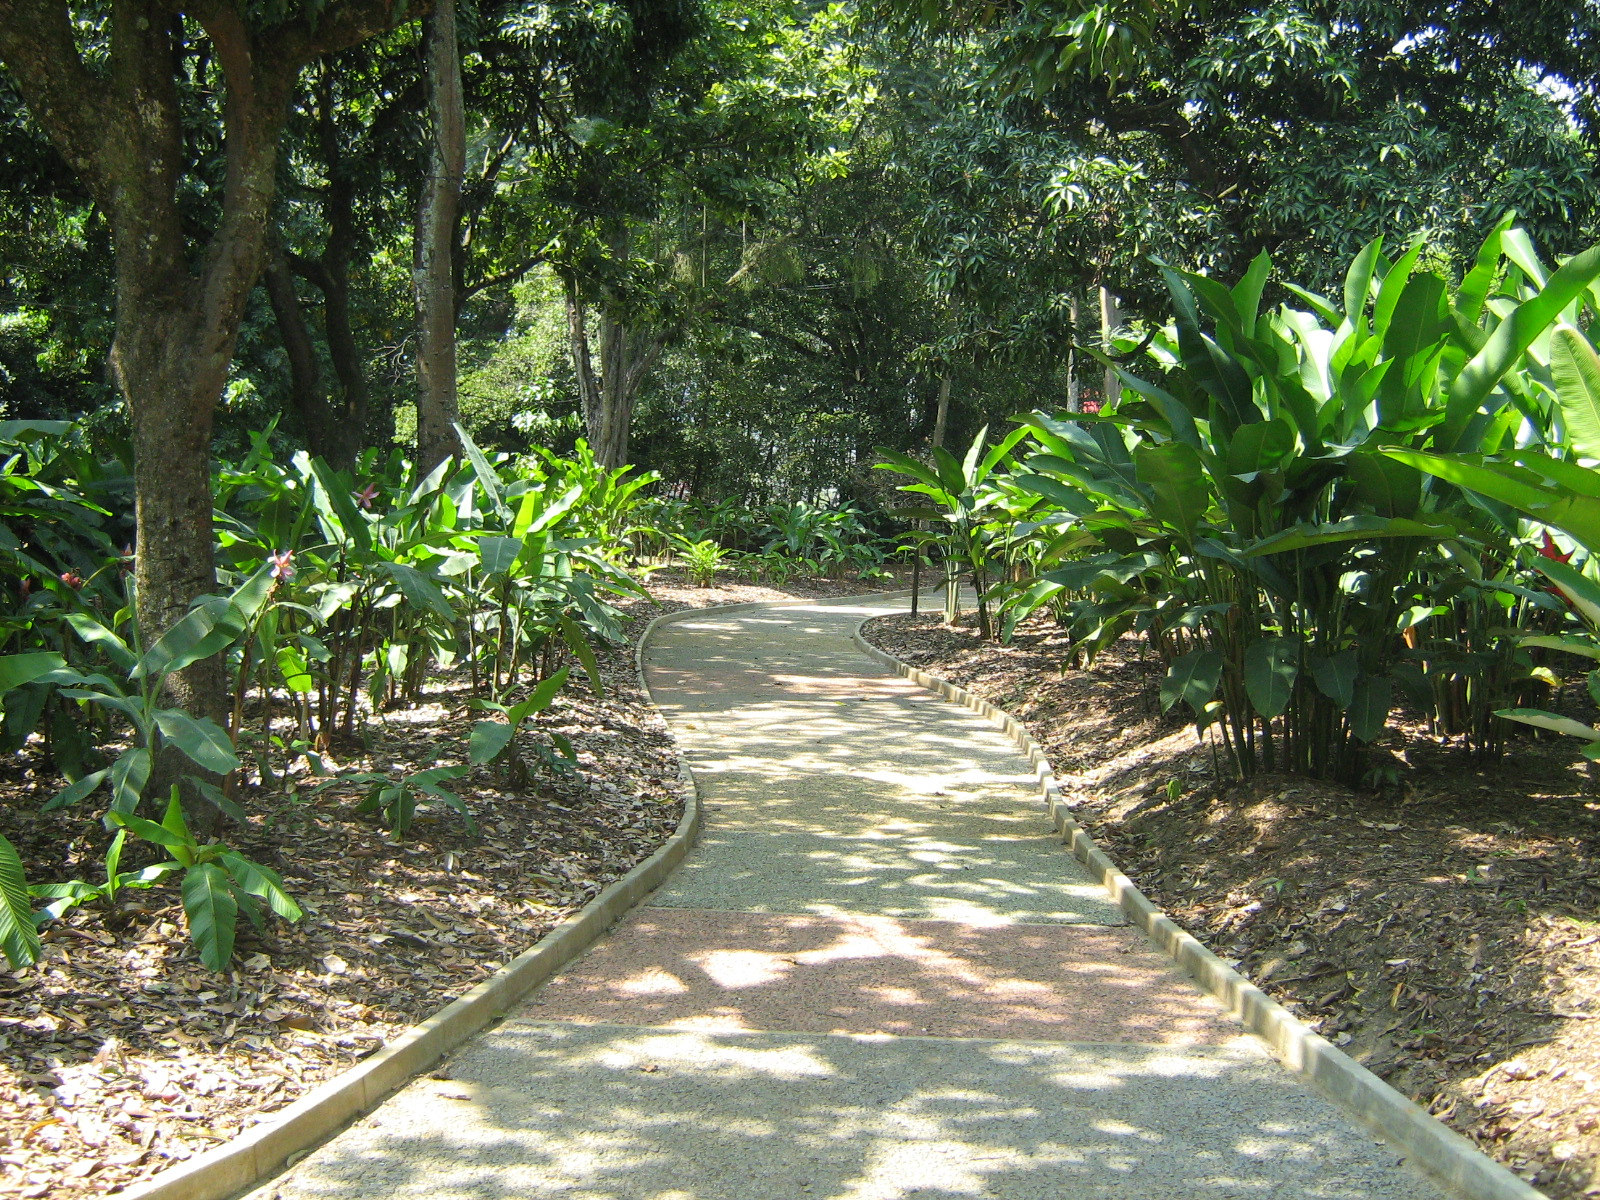 File jardin botanico de medellin camino 2 jpg wikimedia for Bodas en el jardin botanico de medellin